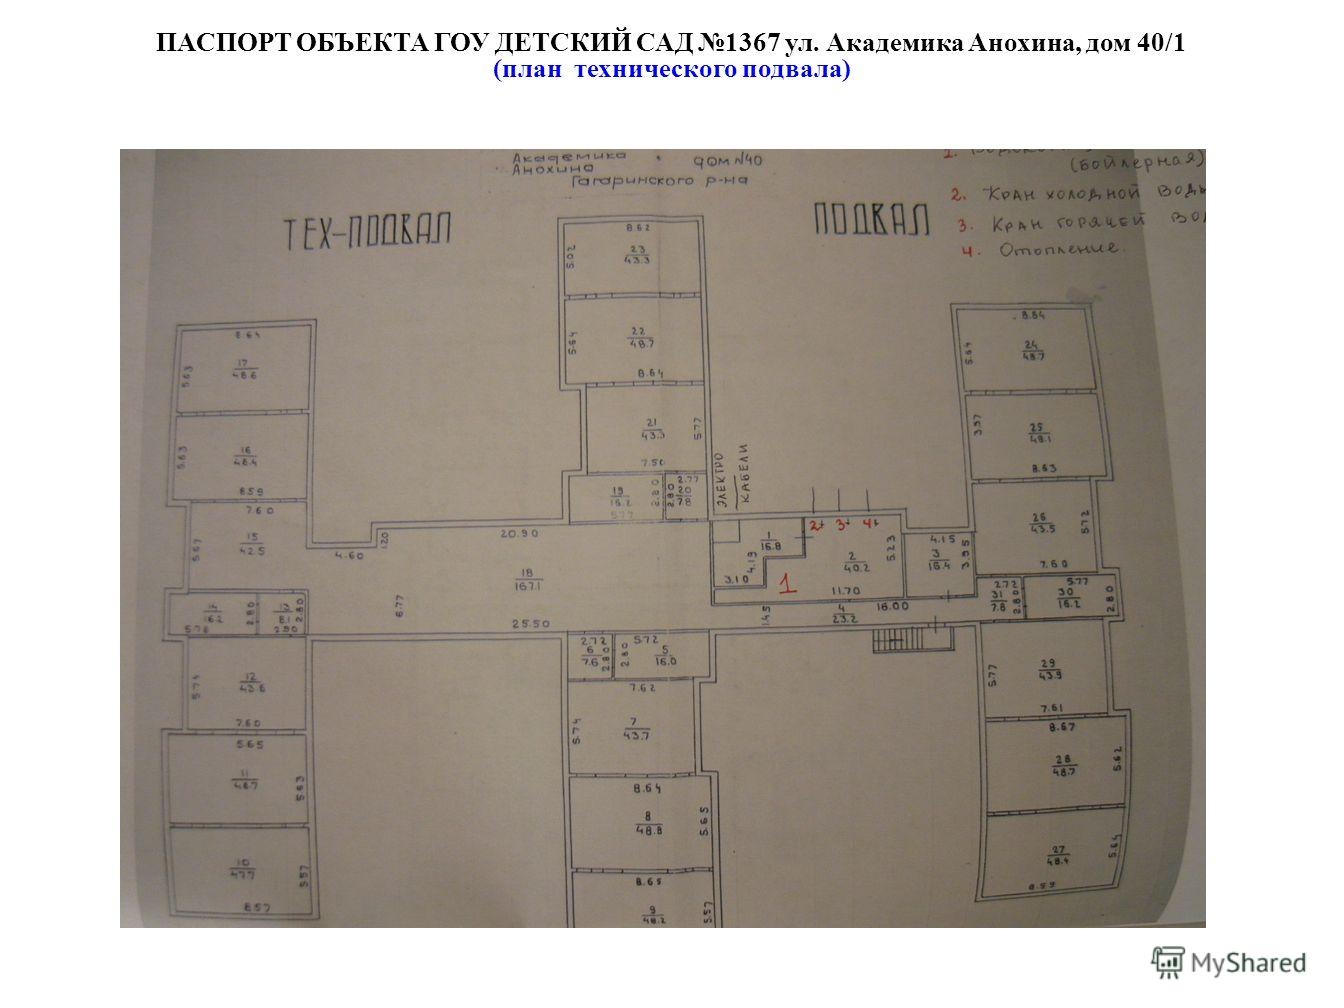 ПАСПОРТ ОБЪЕКТА ГОУ ДЕТСКИЙ САД 1367 ул. Академика Анохина, дом 40/1 (план технического подвала)